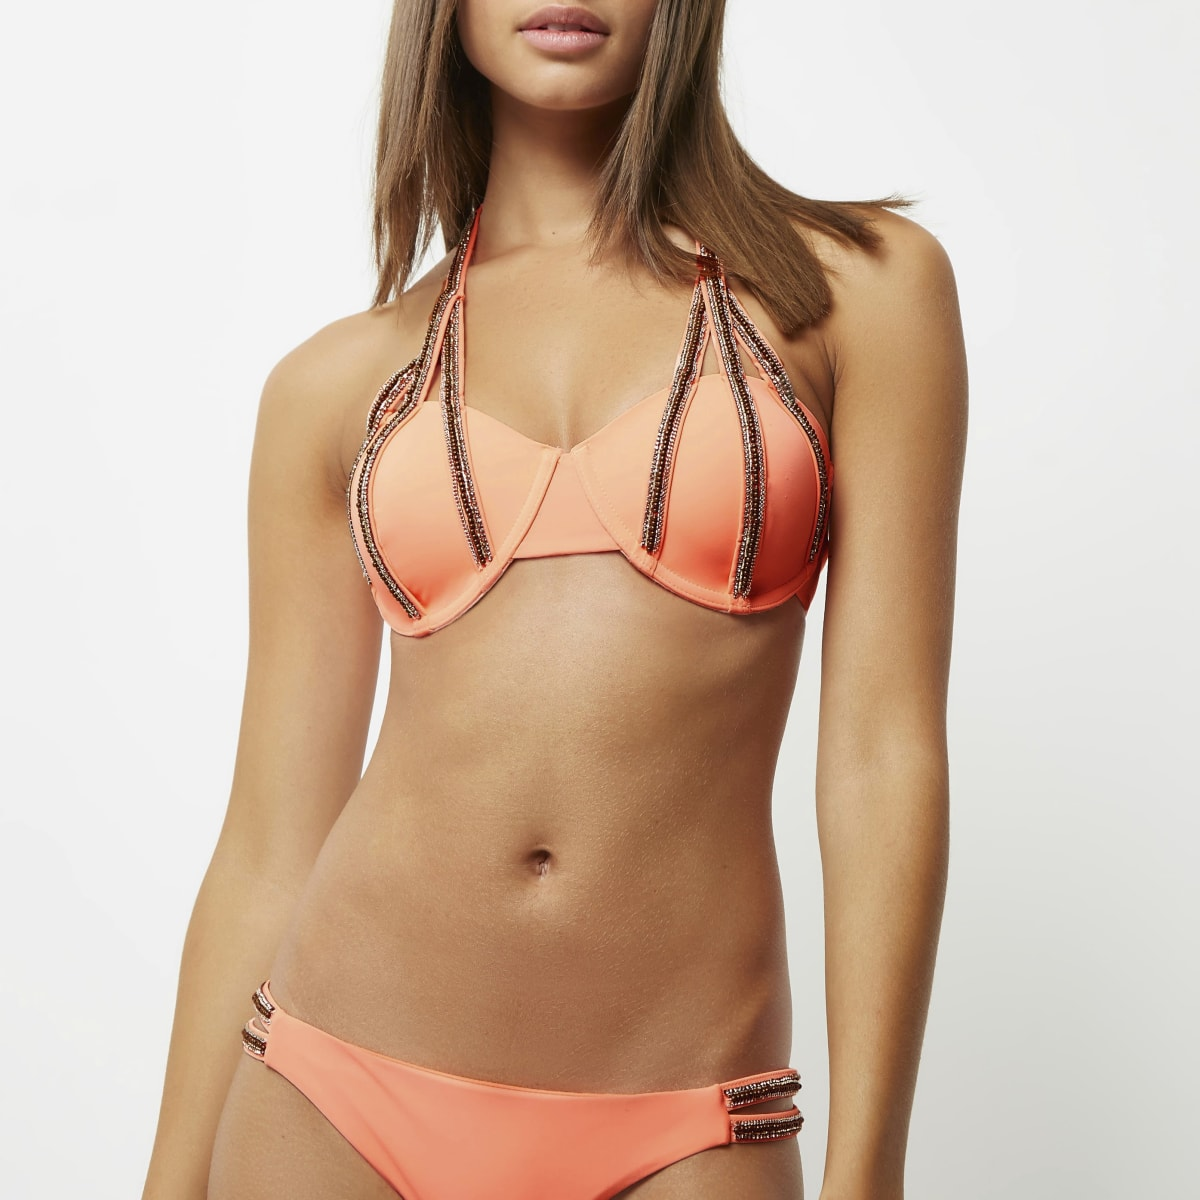 Coral embellished balconette bikini top